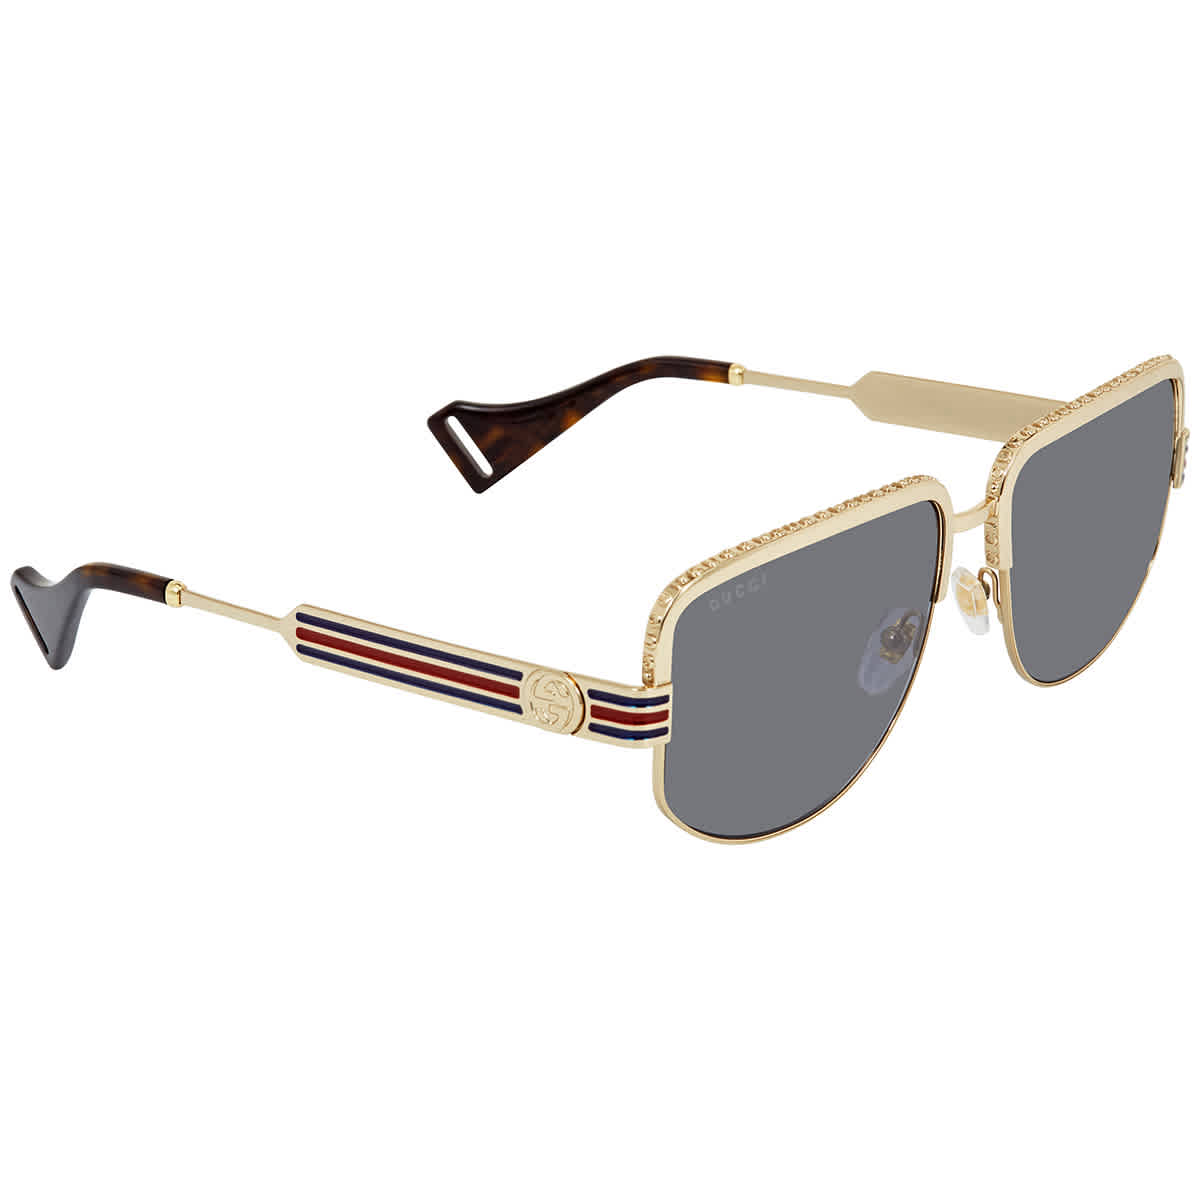 Gucci Blue Mens Sunglasses Gg0585s 004 59 In Blue,gold Tone